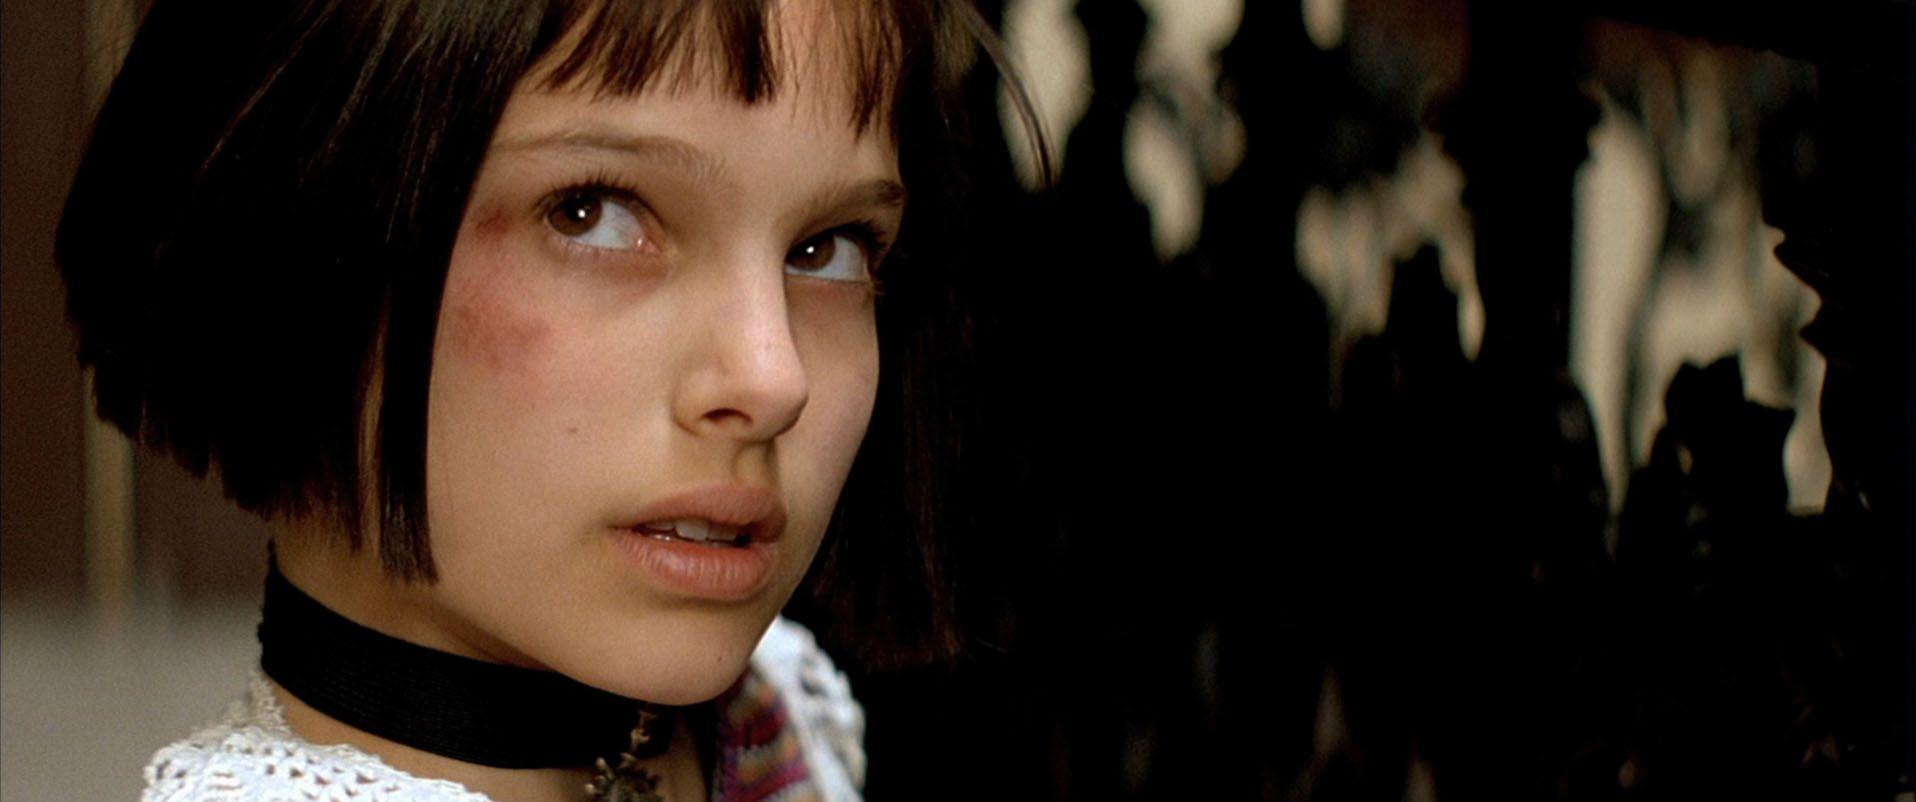 Leon - El Profesional - Natalie Portman